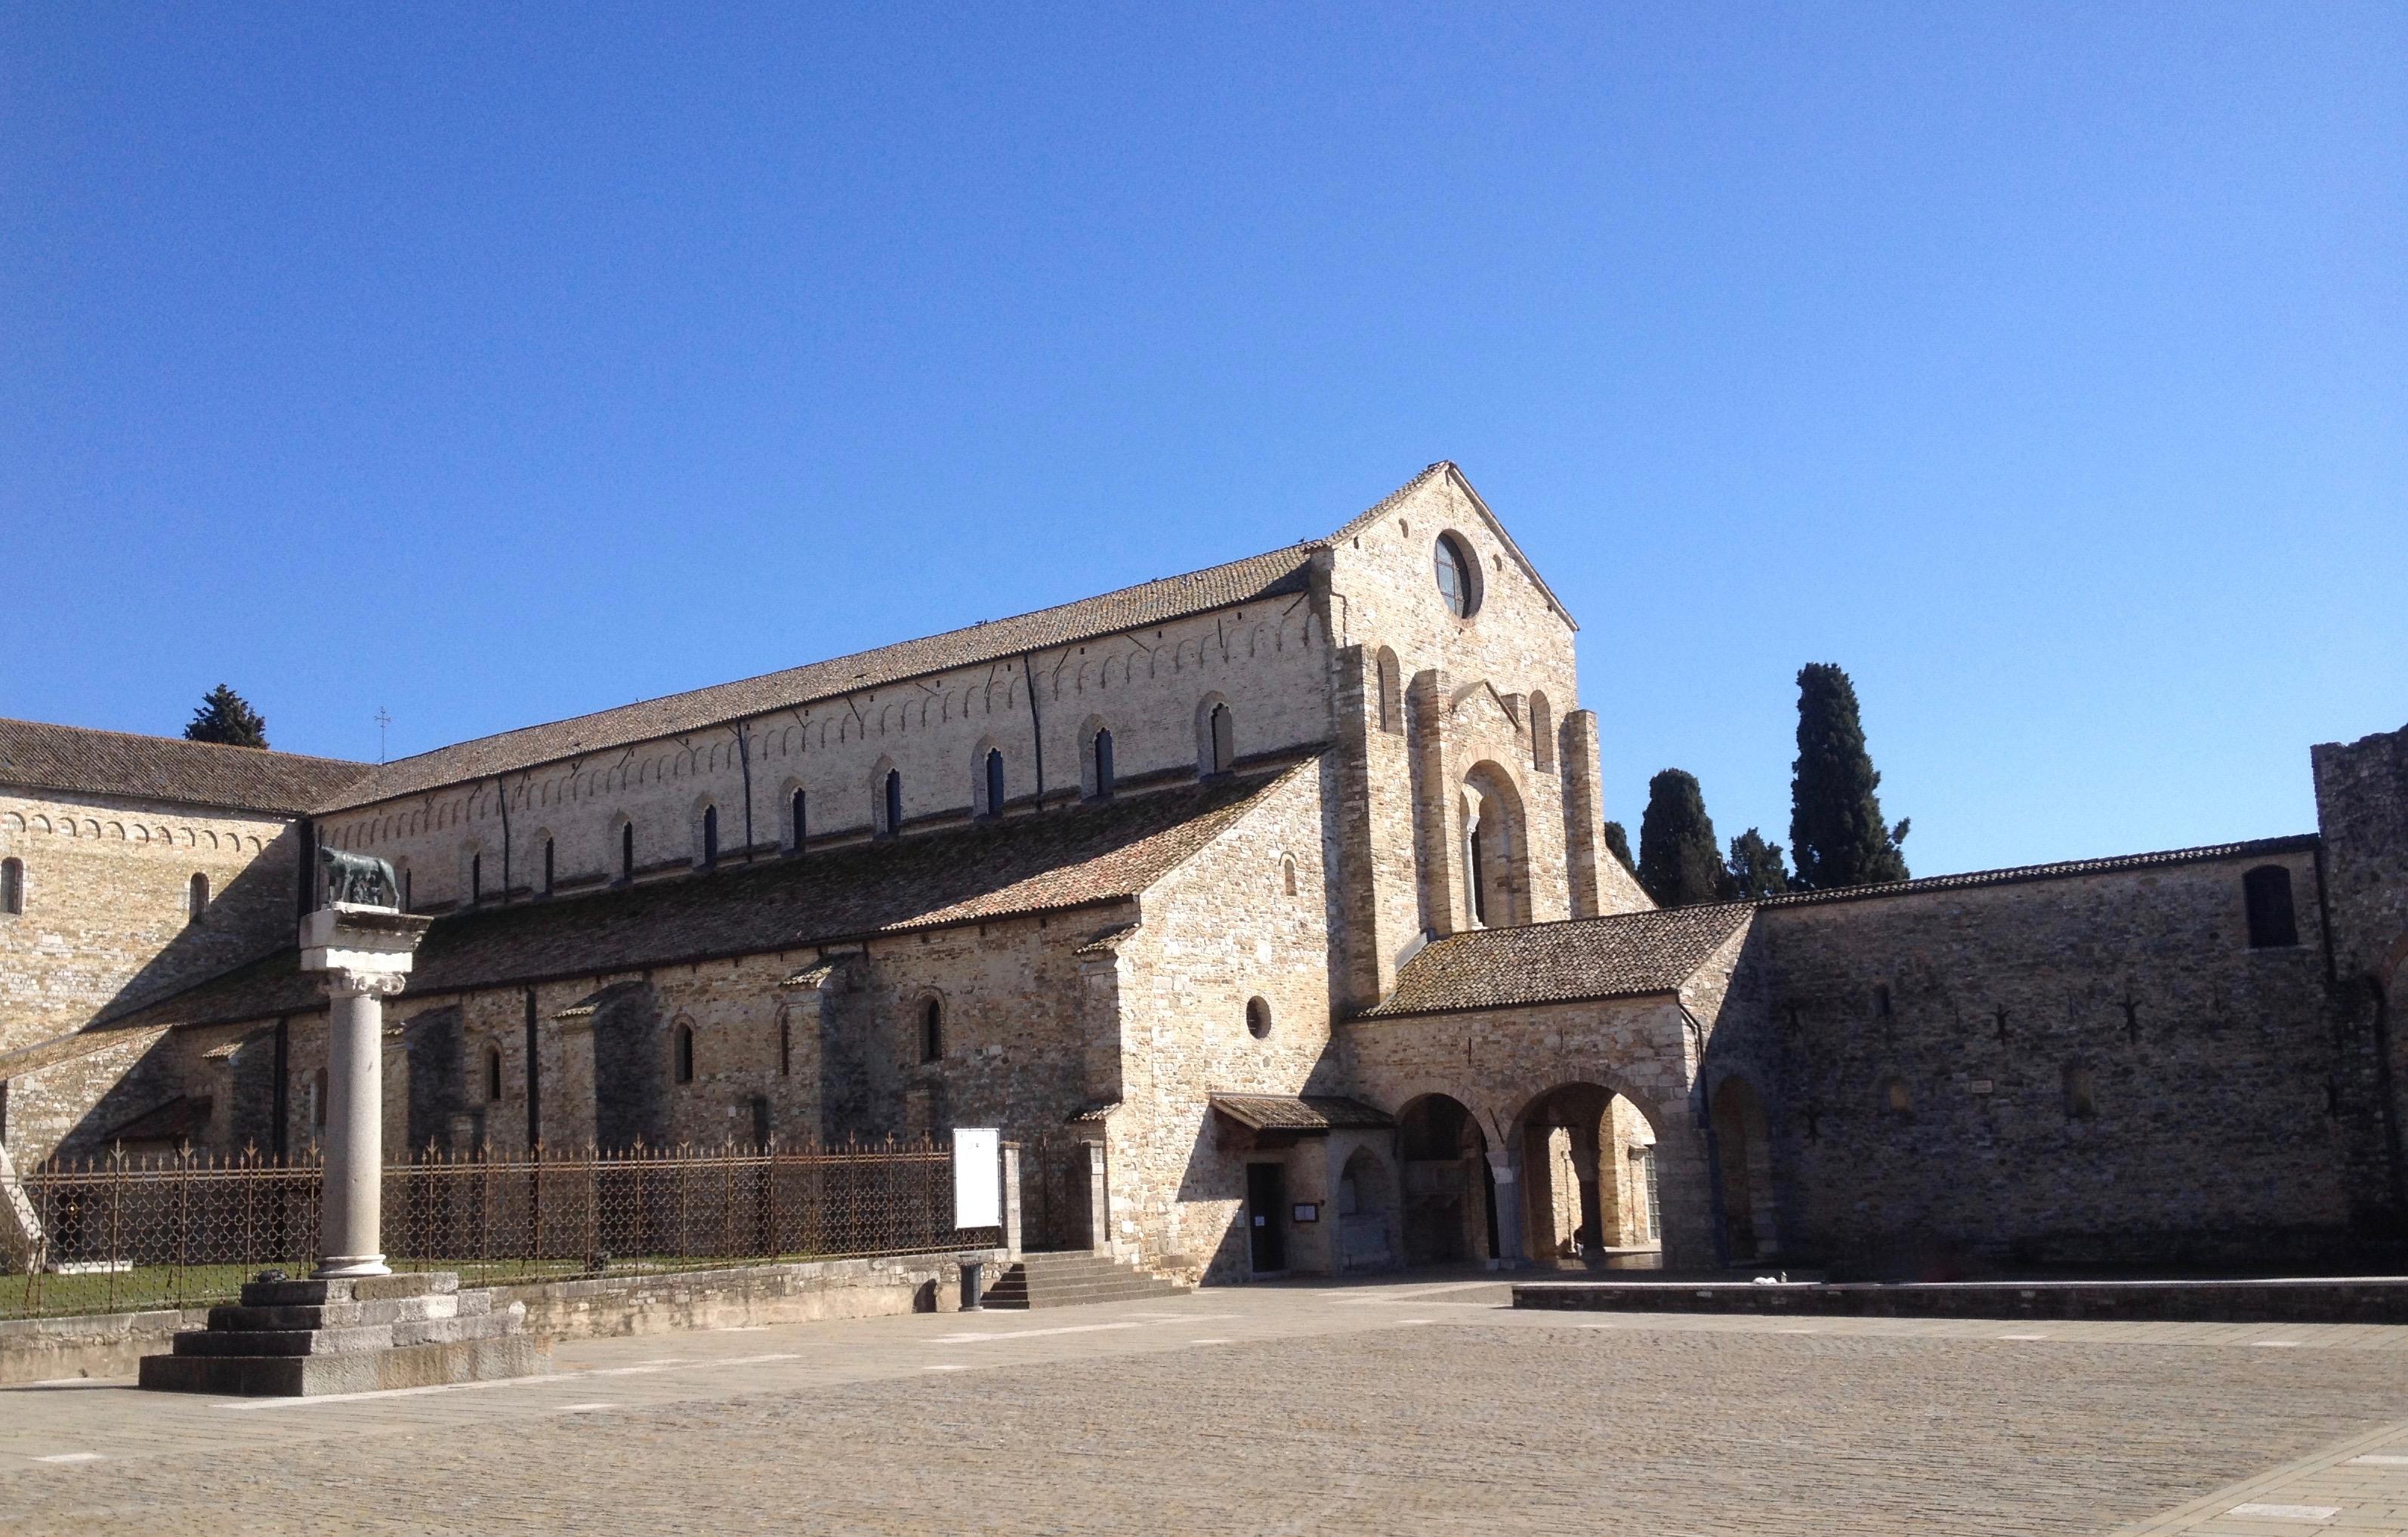 visita guidata a Aquileia